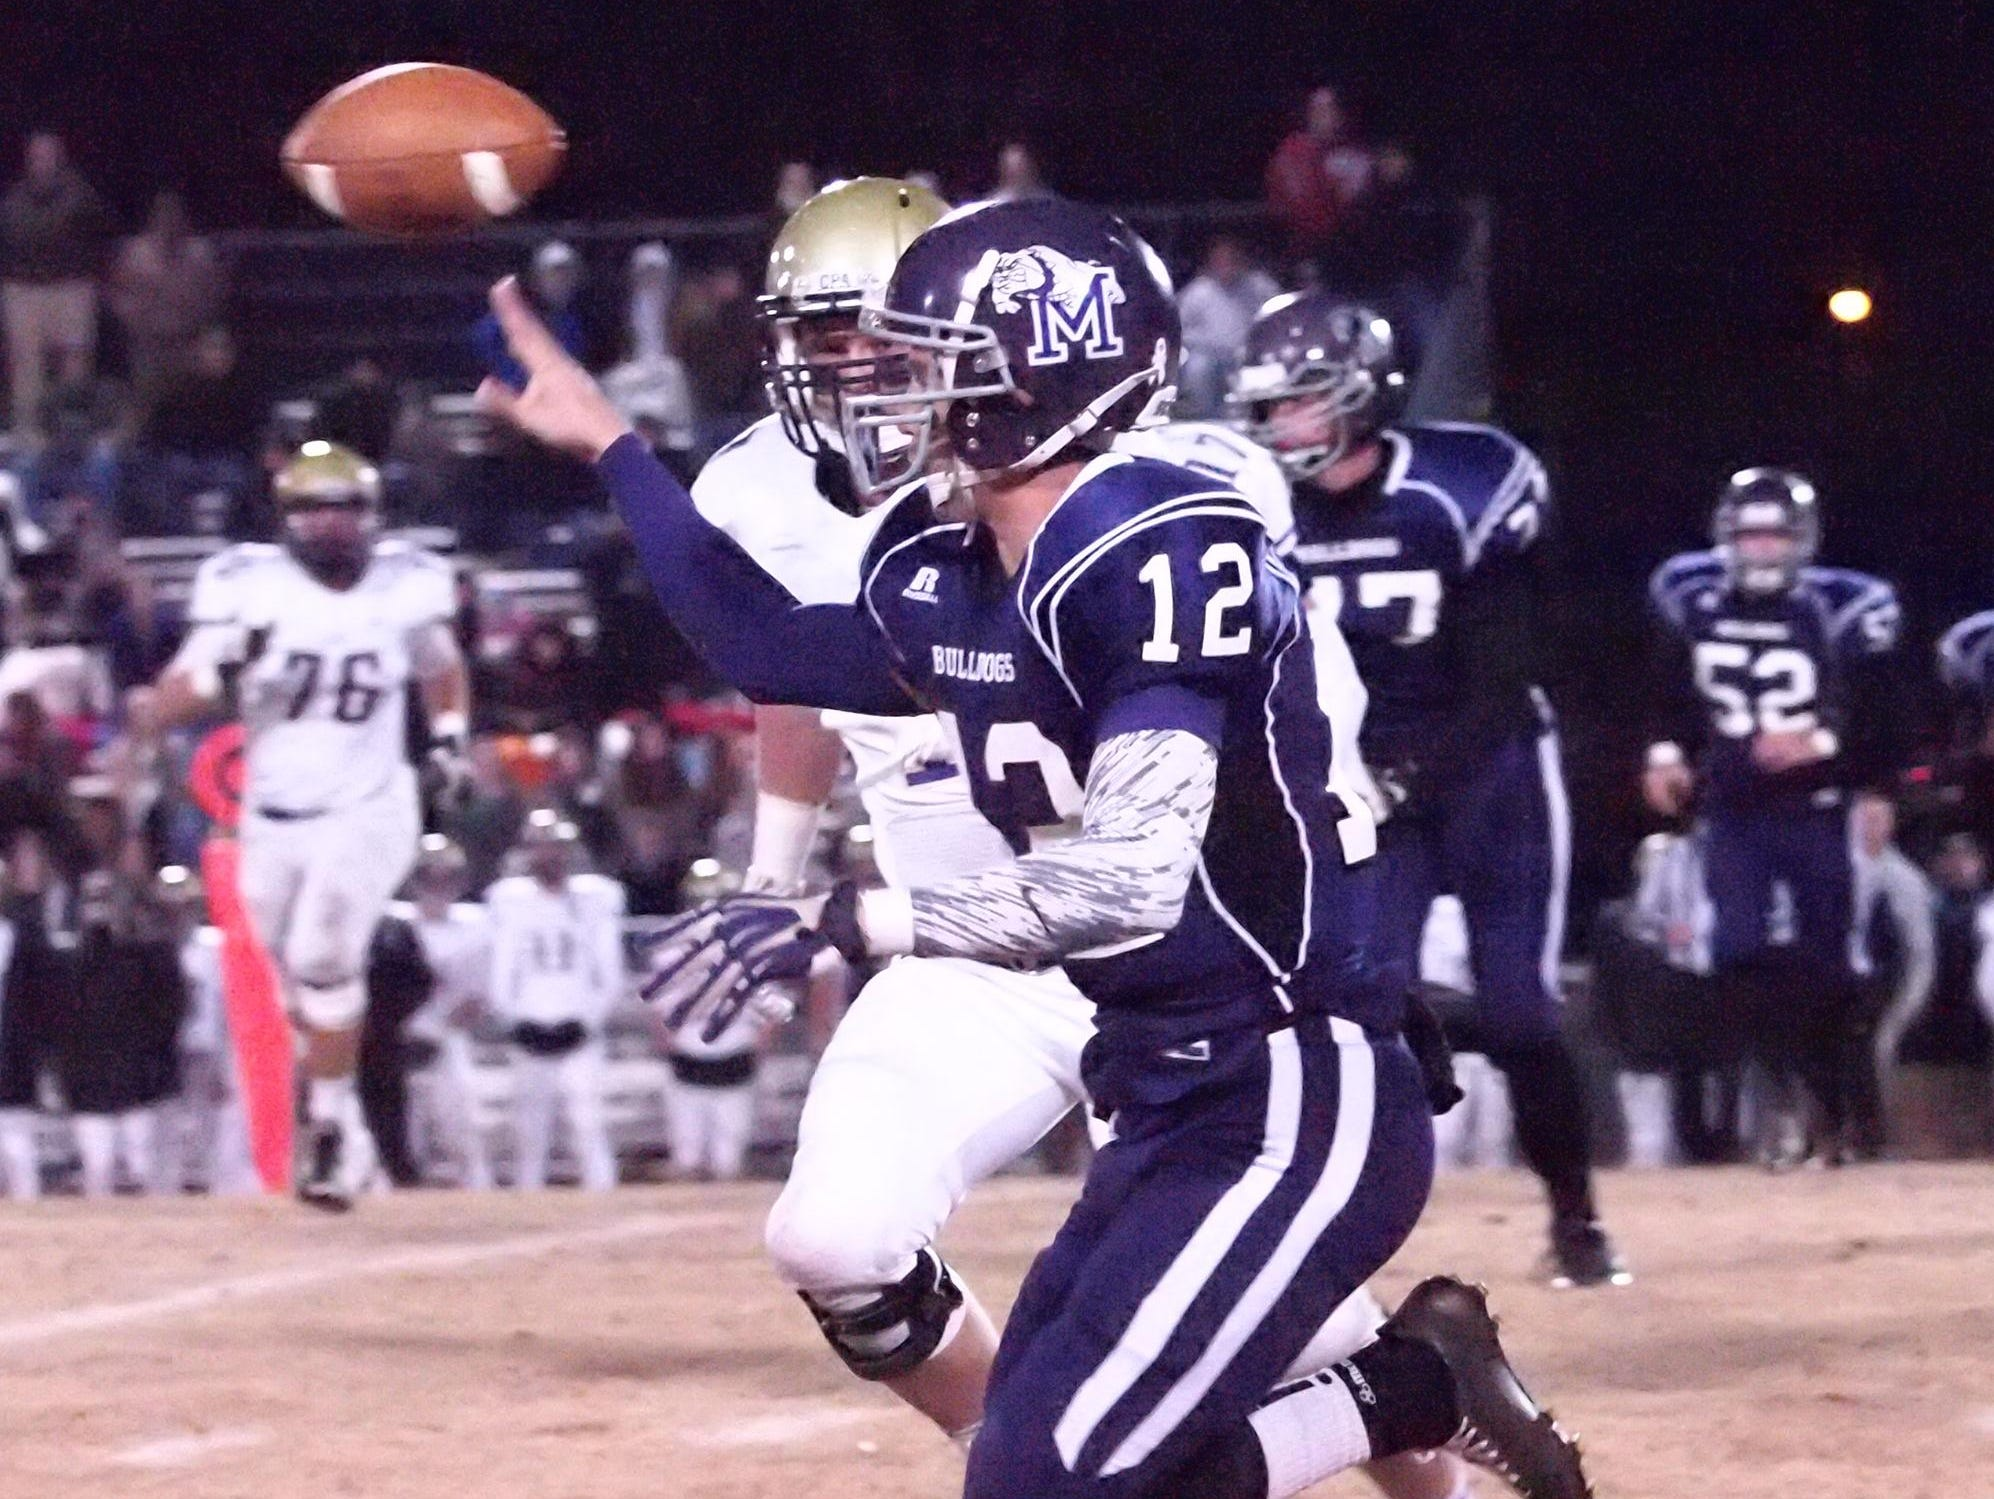 Milan quarterback Landon Walker returns to help the Bulldogs this fall.